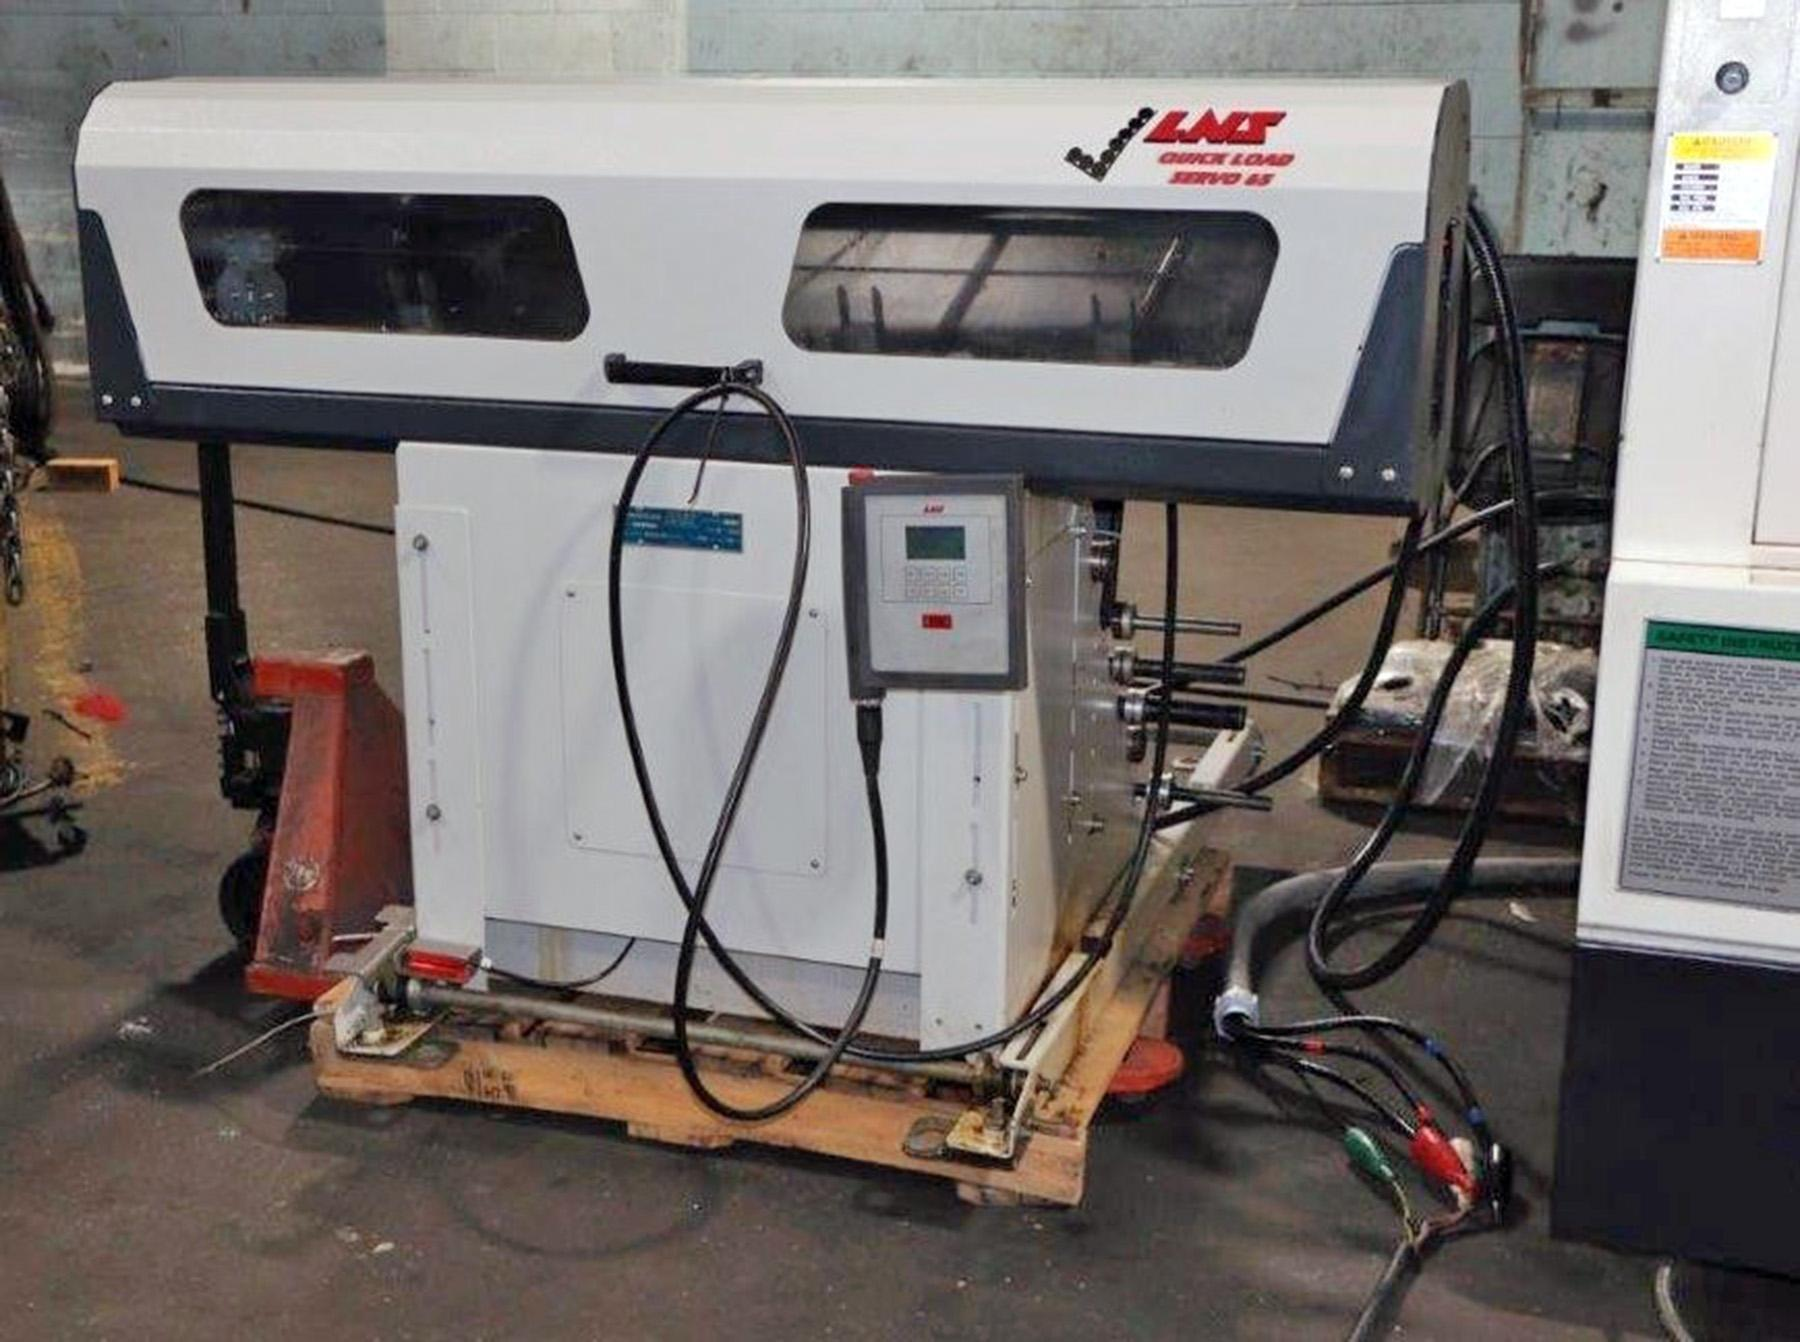 USED, MAZAK QUICK TURN SMART 200 CNC TURNING CENTER WITH LNS BAR FEEDER